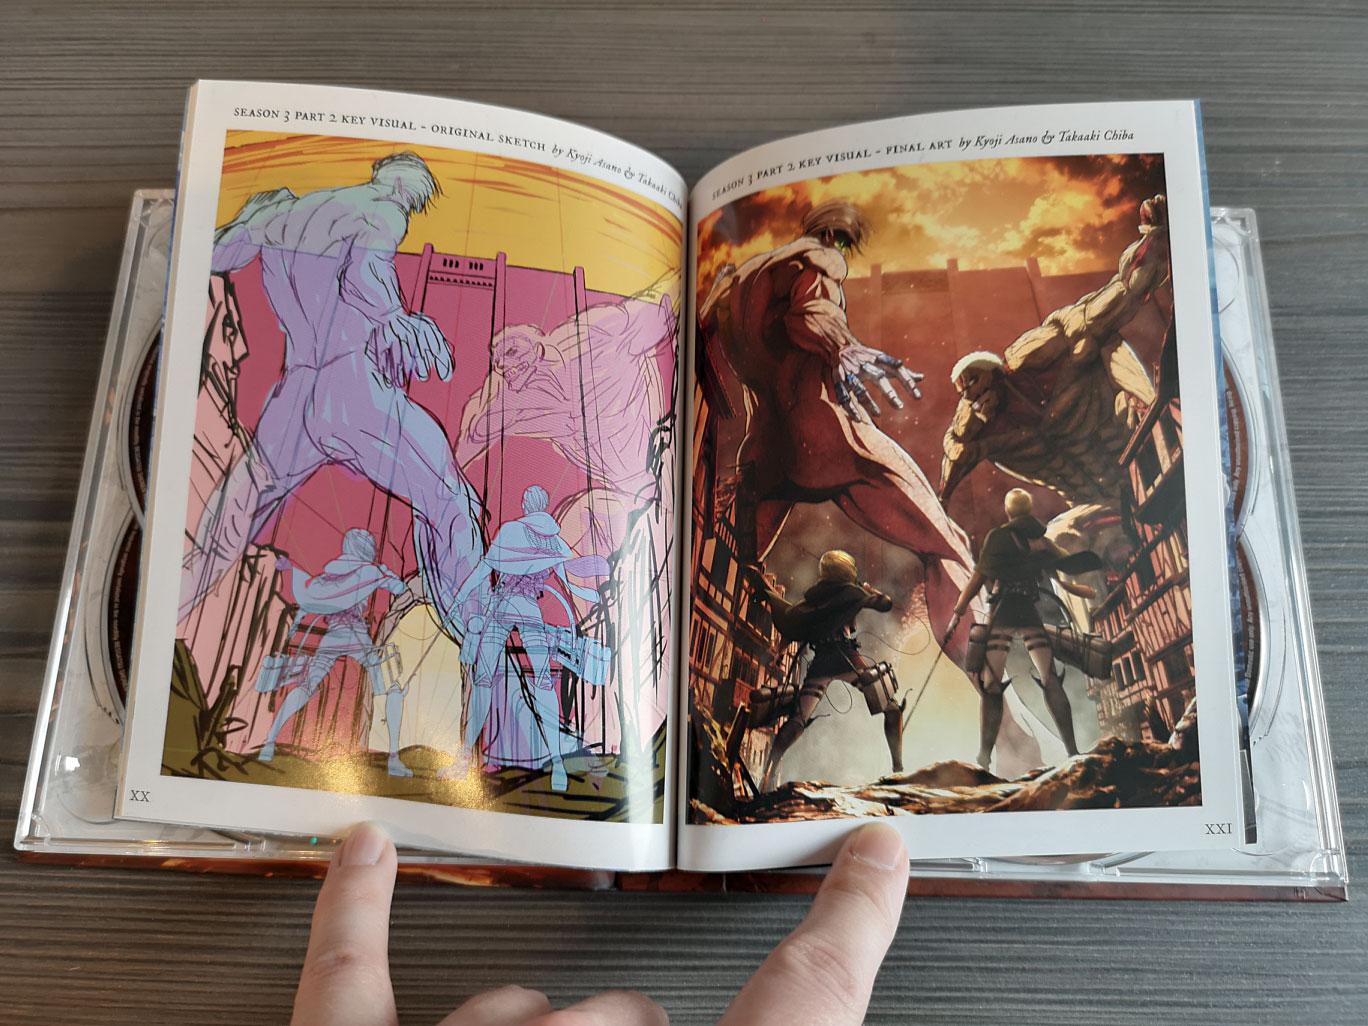 Attack on Titan Season 3 Part 2 (Limited Edition Blu-ray ...